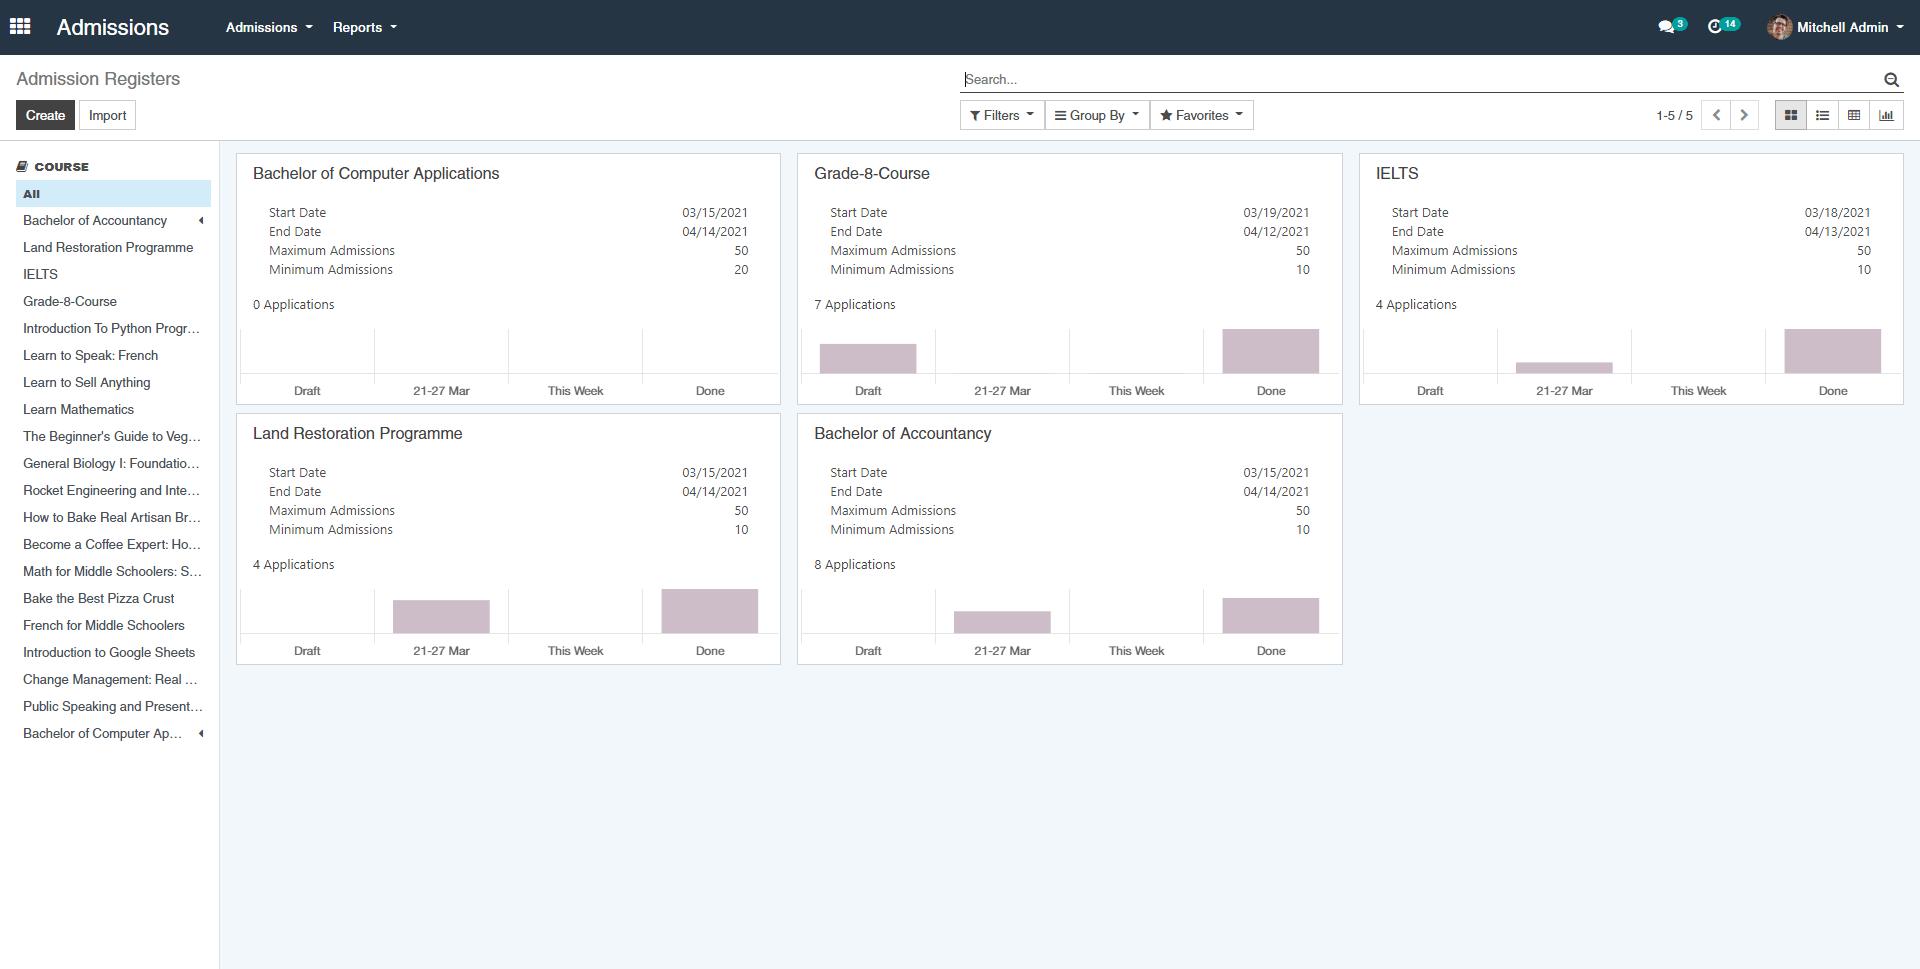 OpenEduCat Software - Admission Register